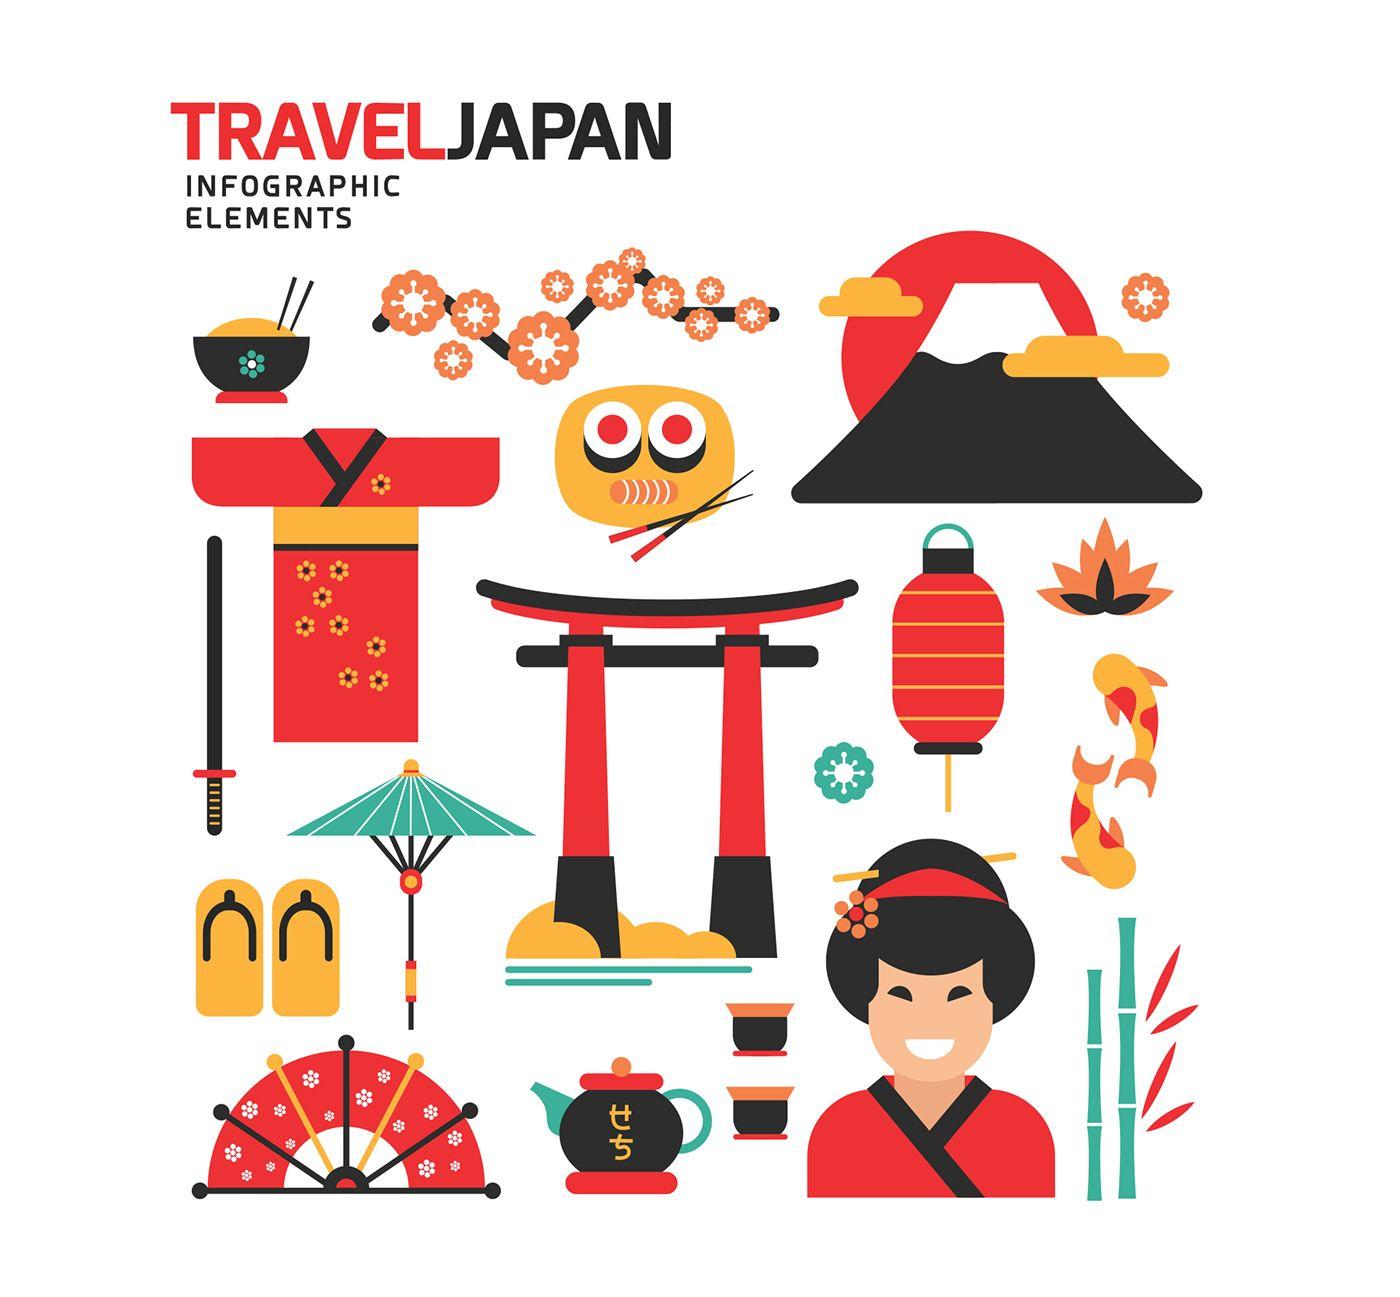 Travel Japan on Behance